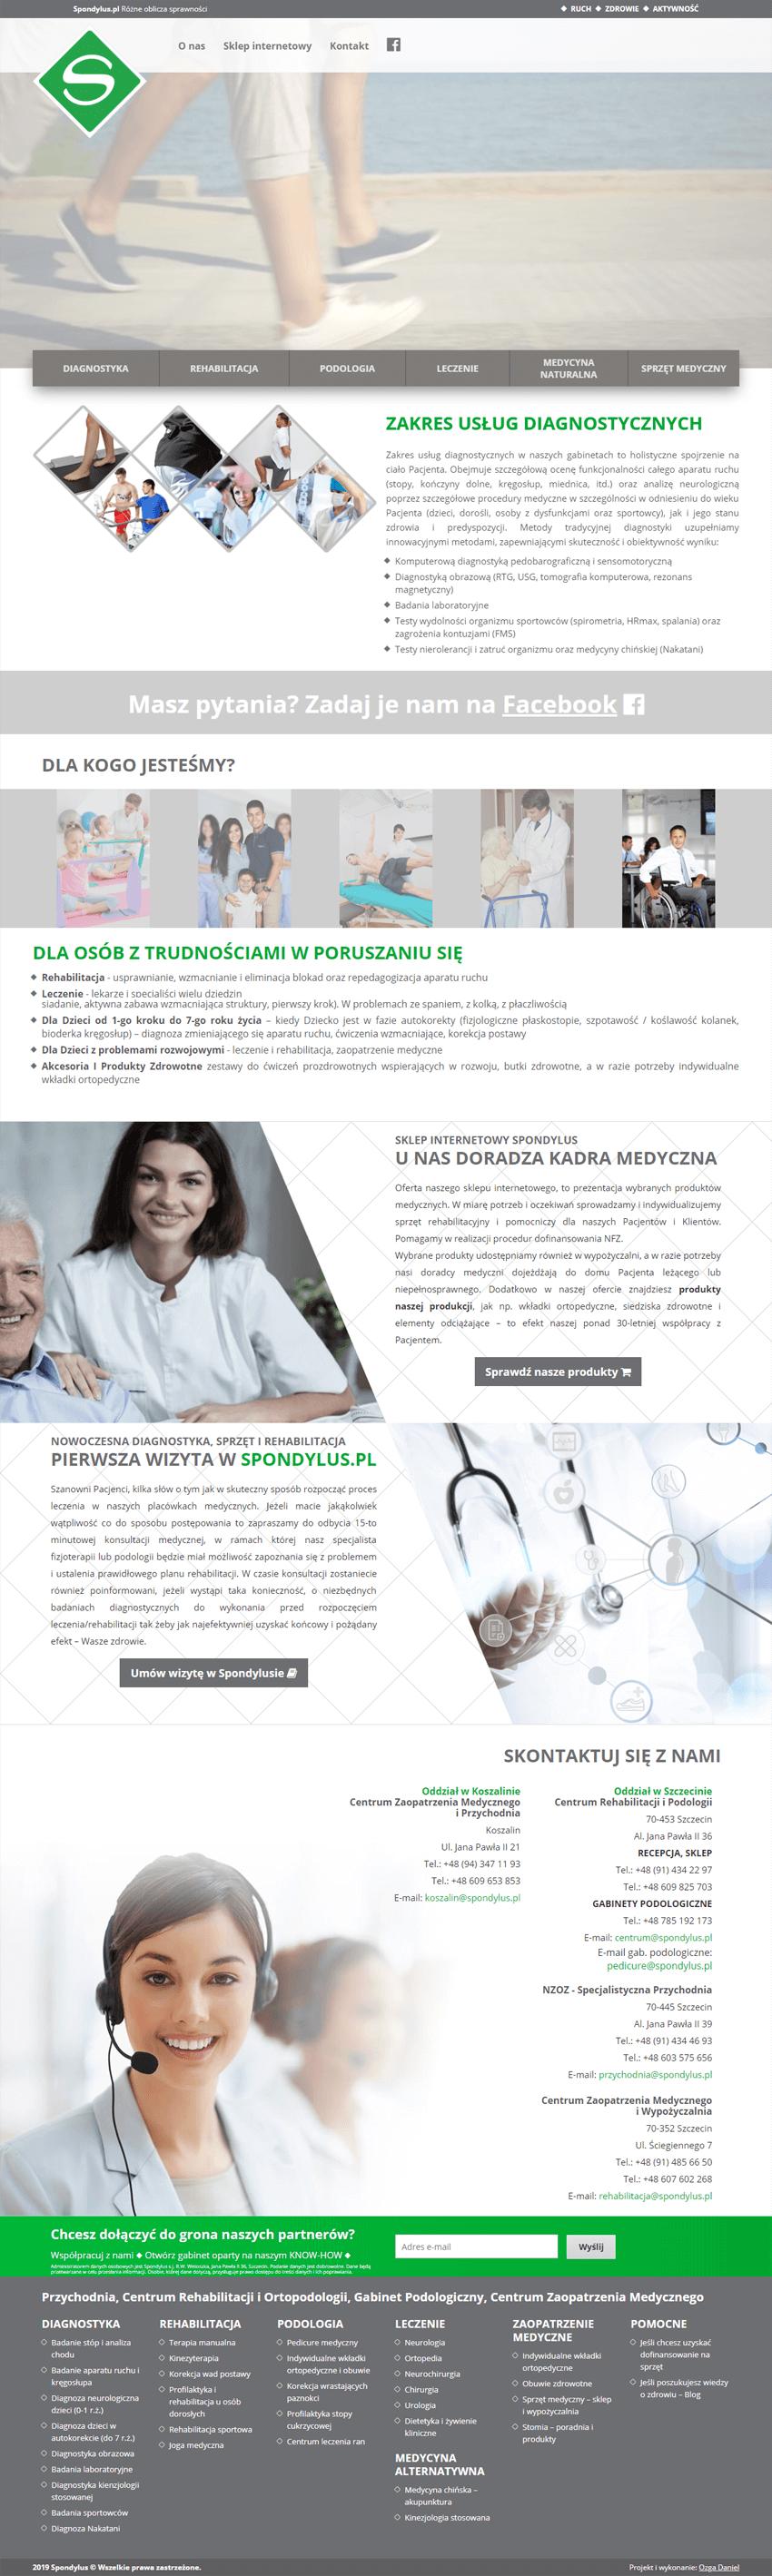 spondylus-pl-2019-08-13-23_04_16